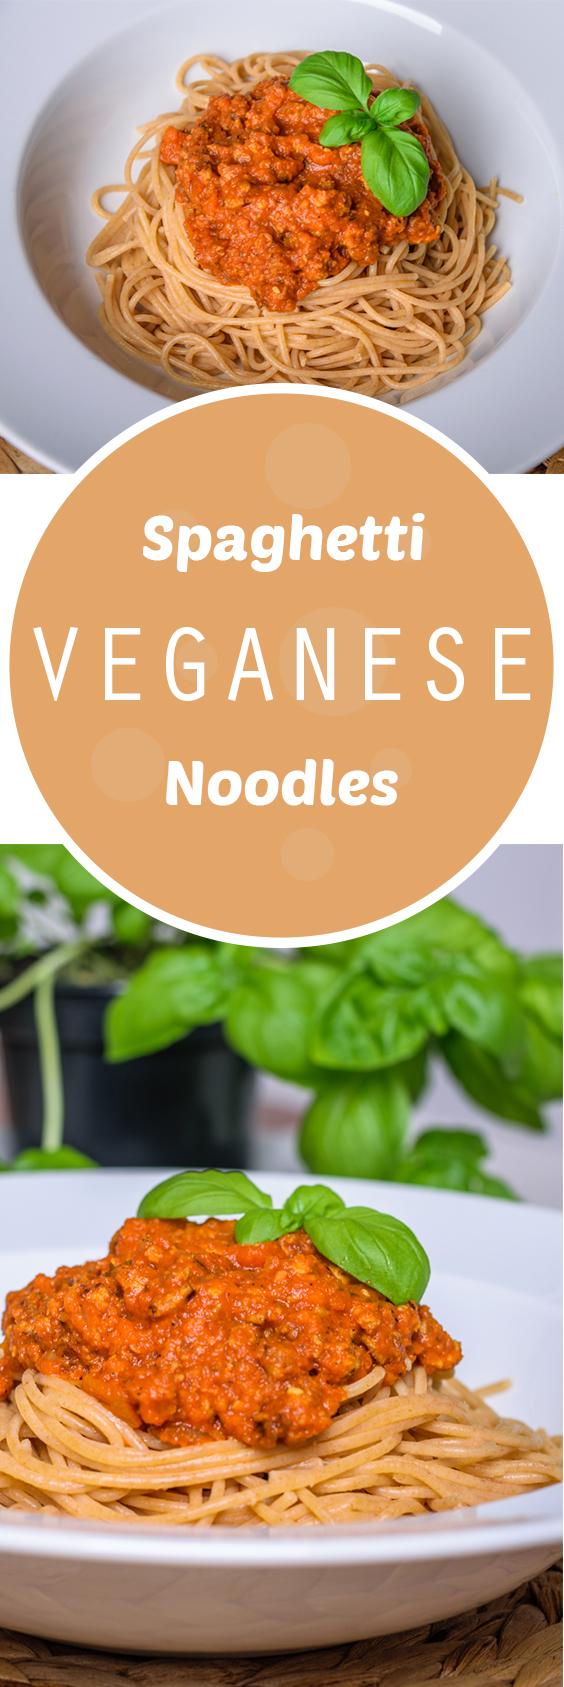 Spaghetti veganese - better than bolognese! Find the whole recipe at www.eat-vegan.de #veganese #tofu #noodles #spaghetti #veganbolognese #pasta